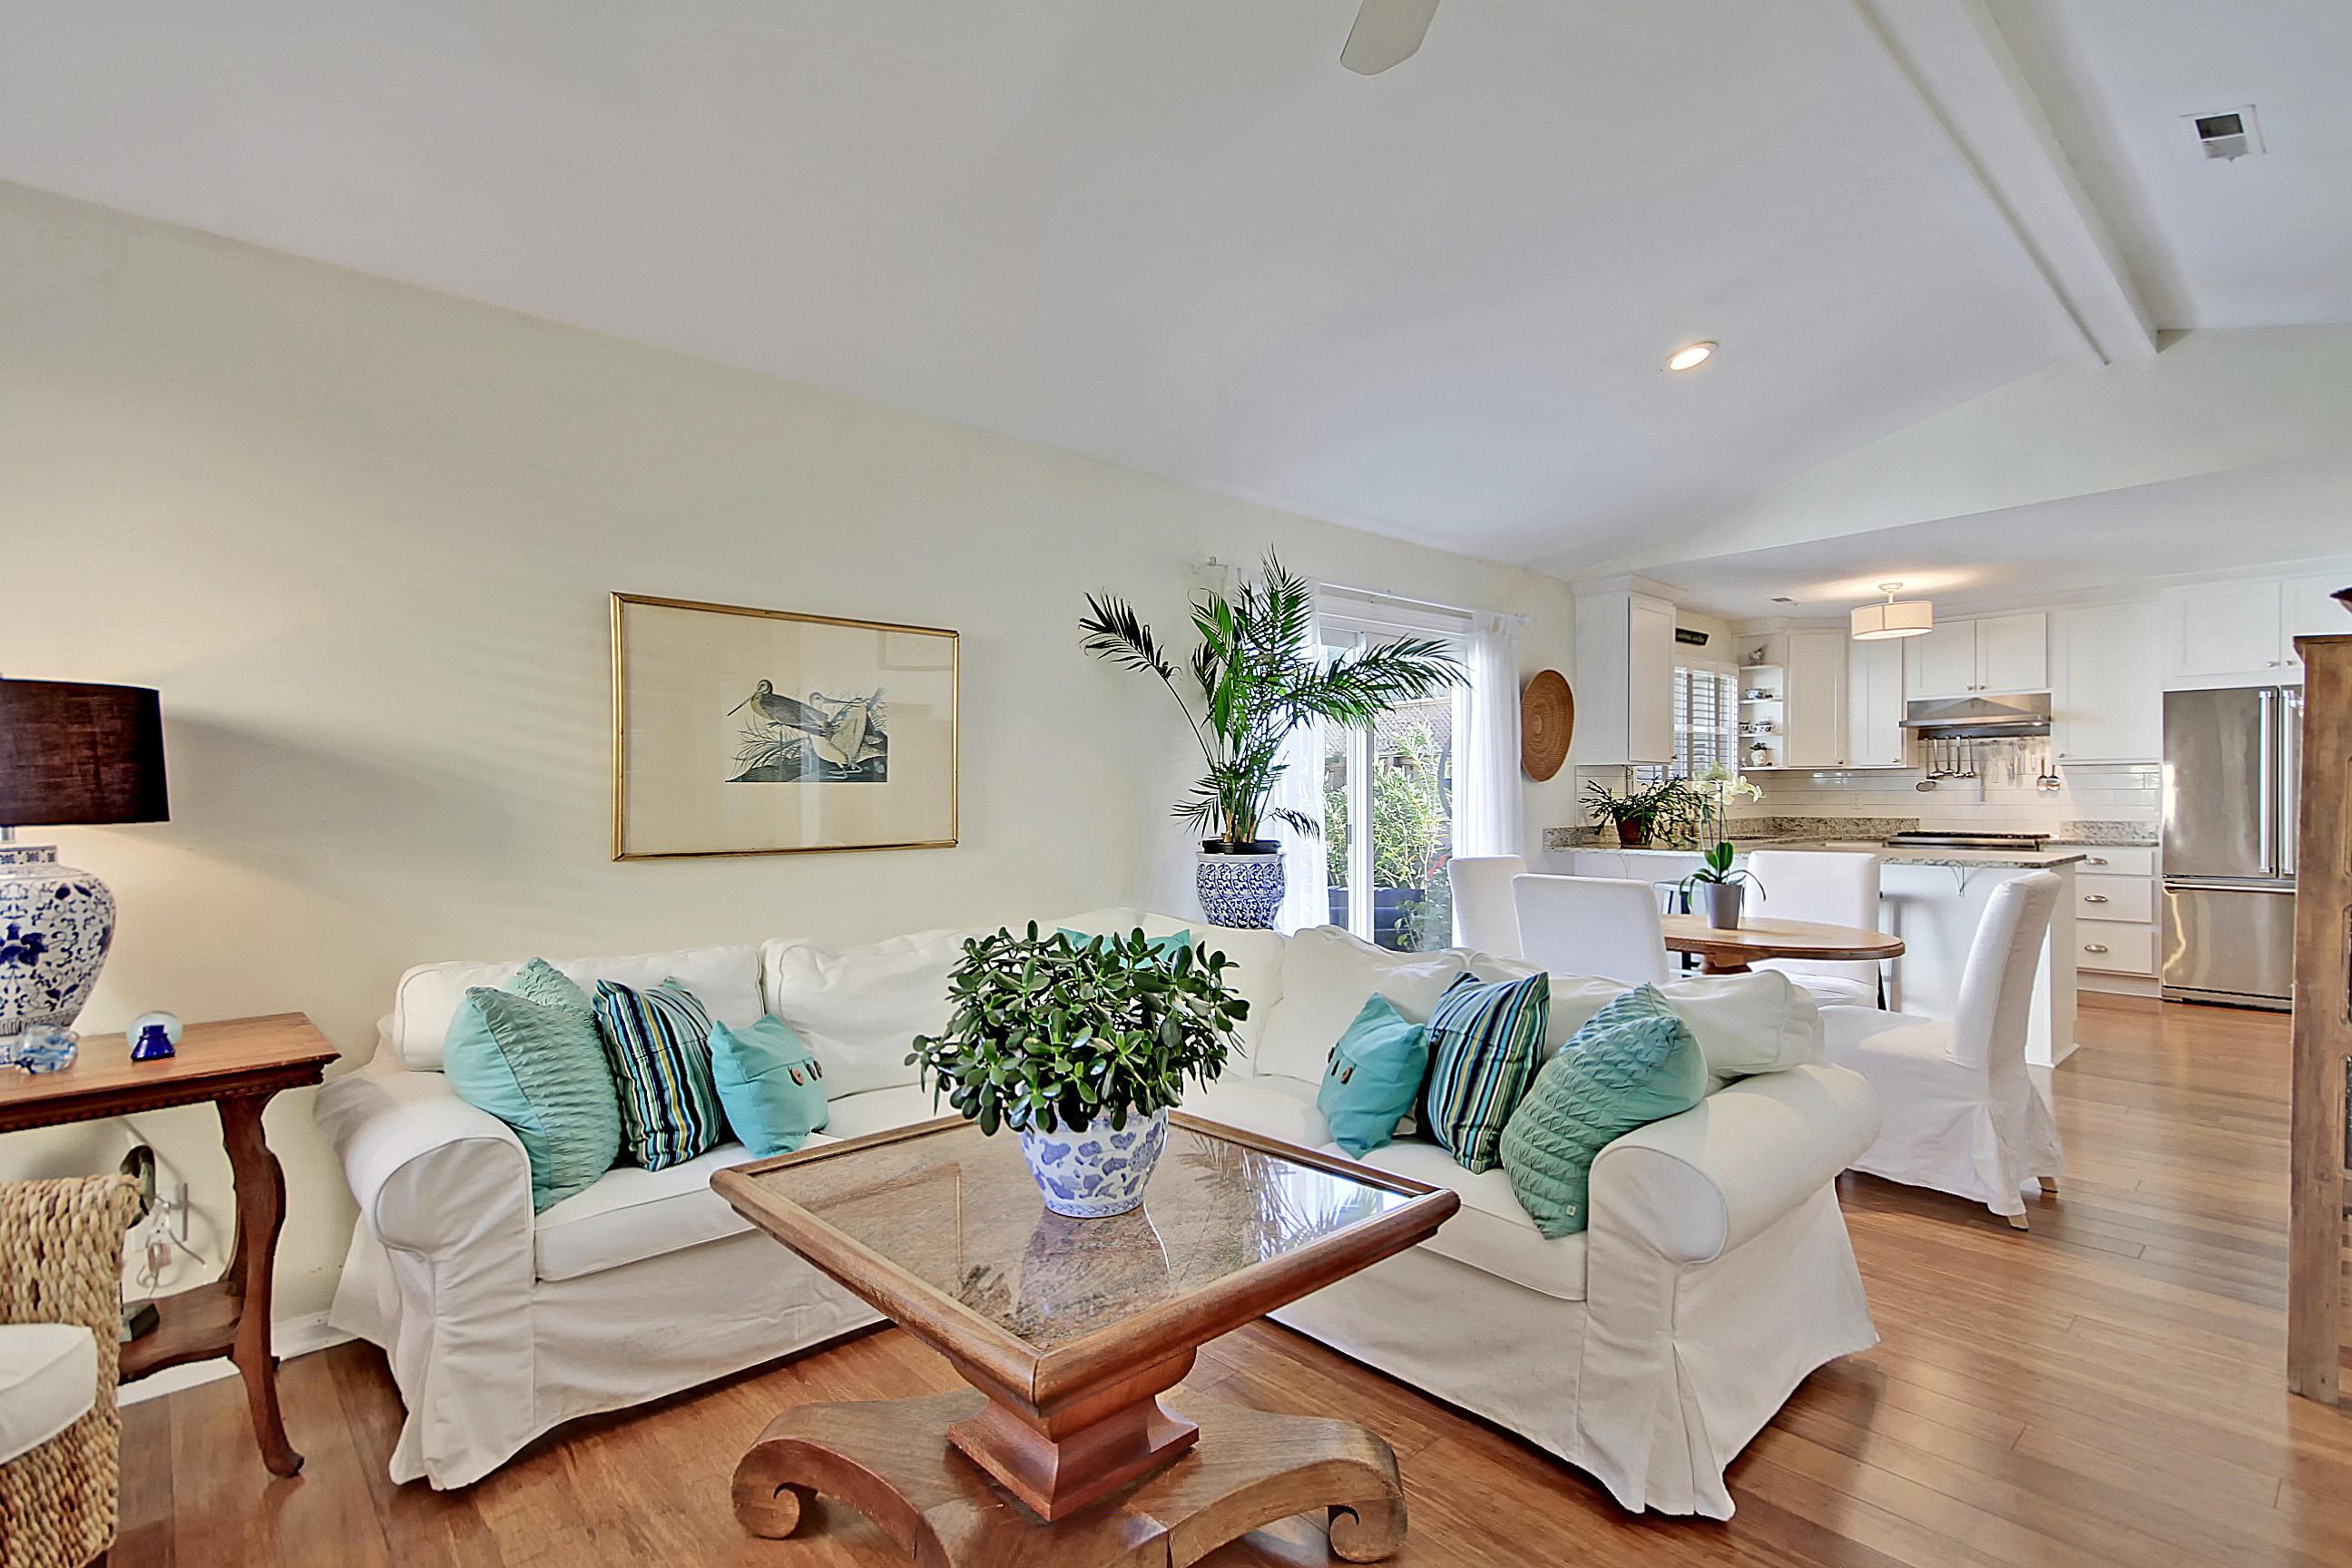 Pirates Cove Homes For Sale - 1492 Ketch, Mount Pleasant, SC - 2